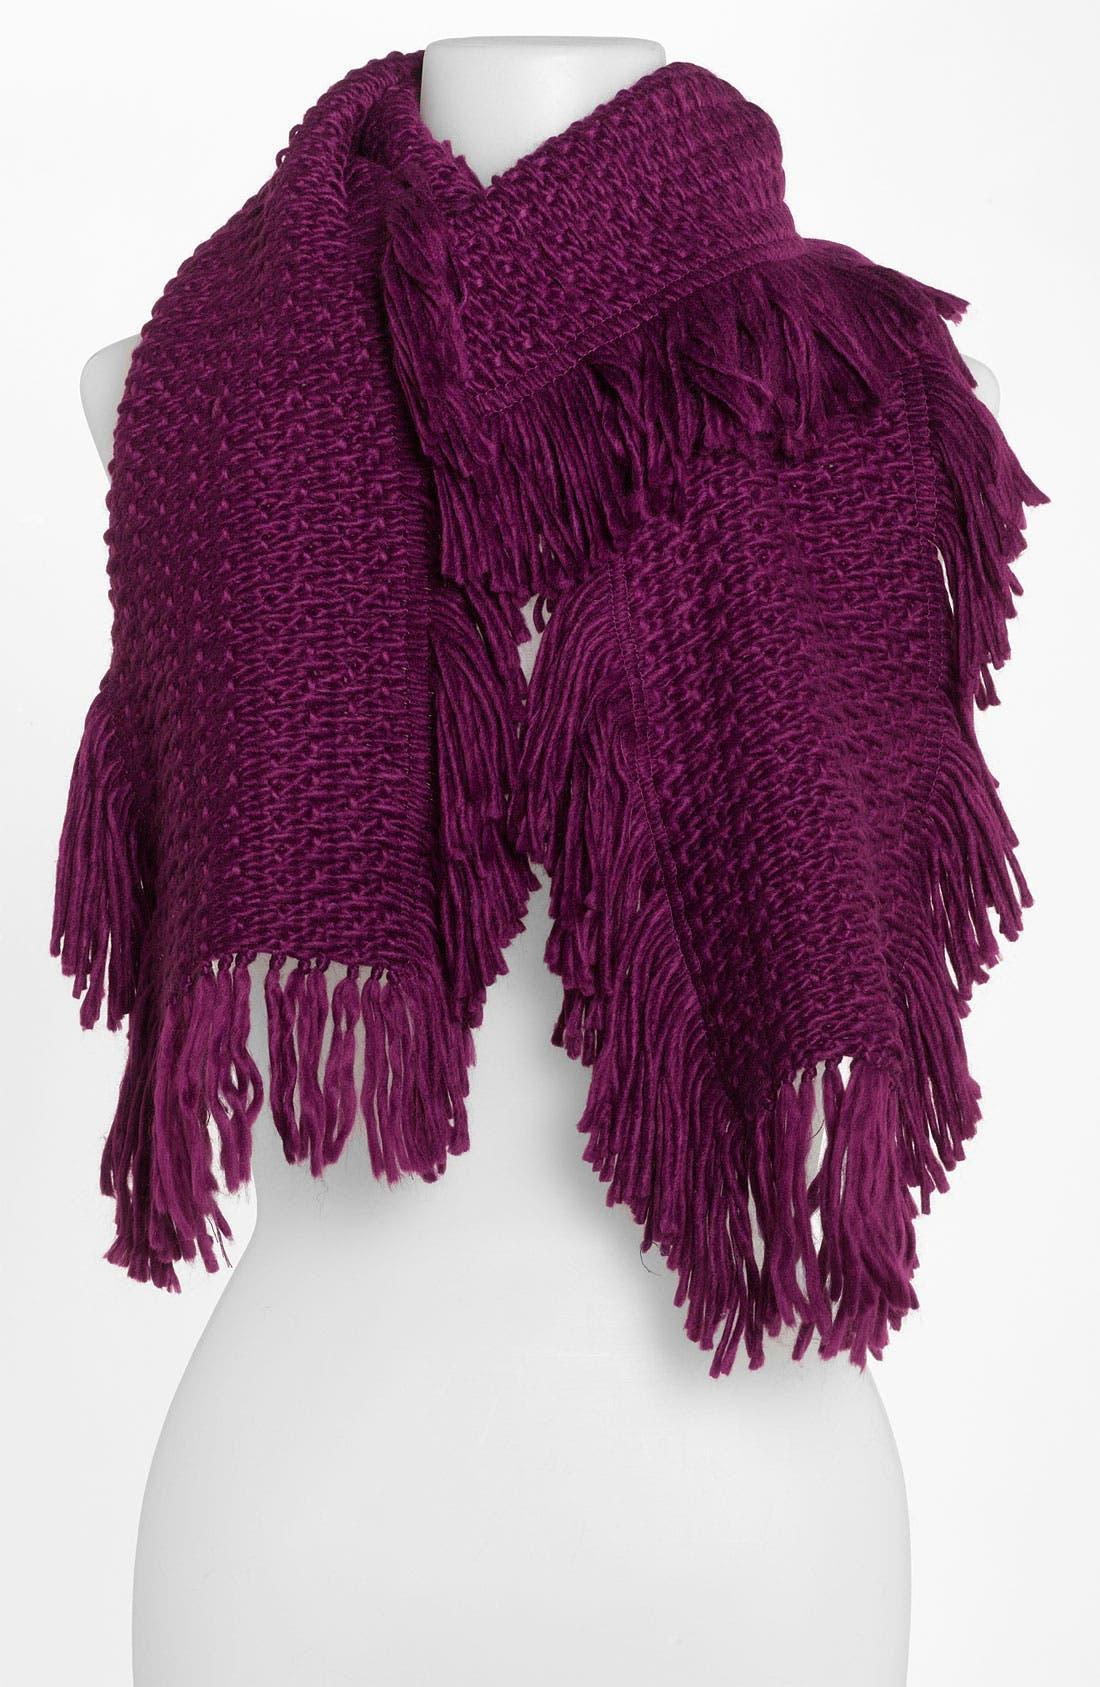 Alternate Image 1 Selected - Echo Fringed Knit Scarf